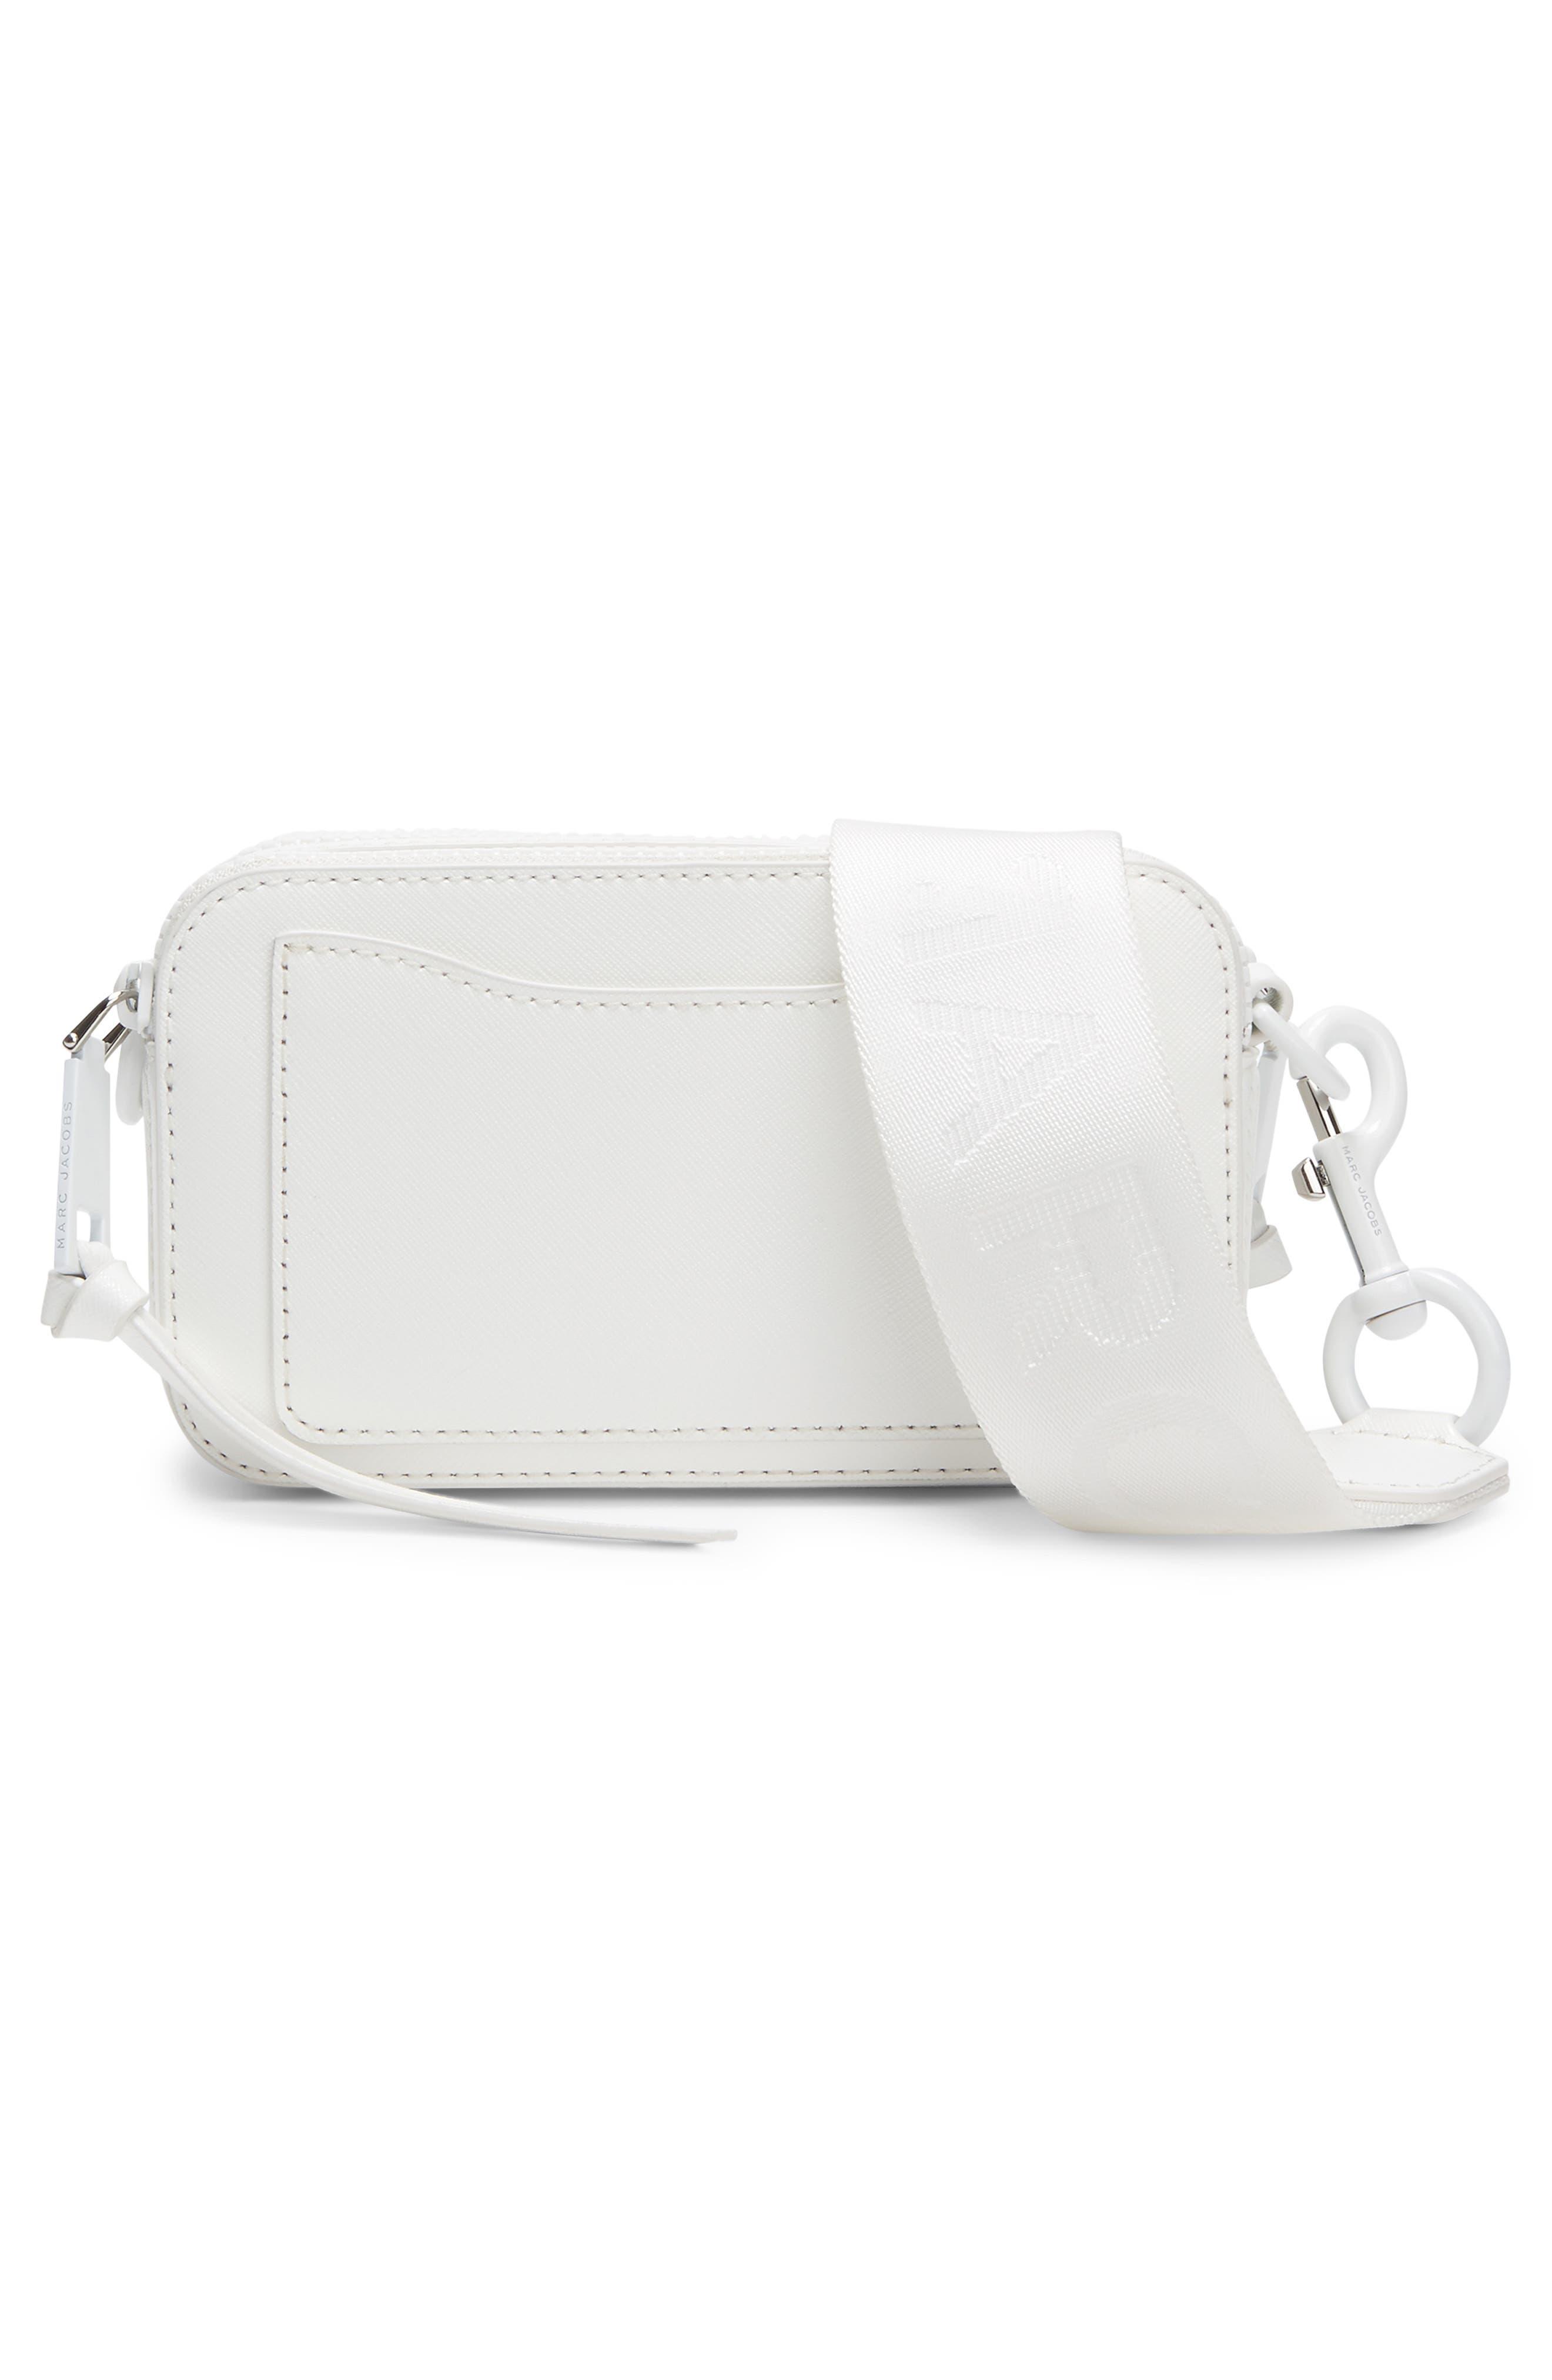 MARC JACOBS, Snapshot Leather Crossbody Bag, Alternate thumbnail 2, color, MOON WHITE